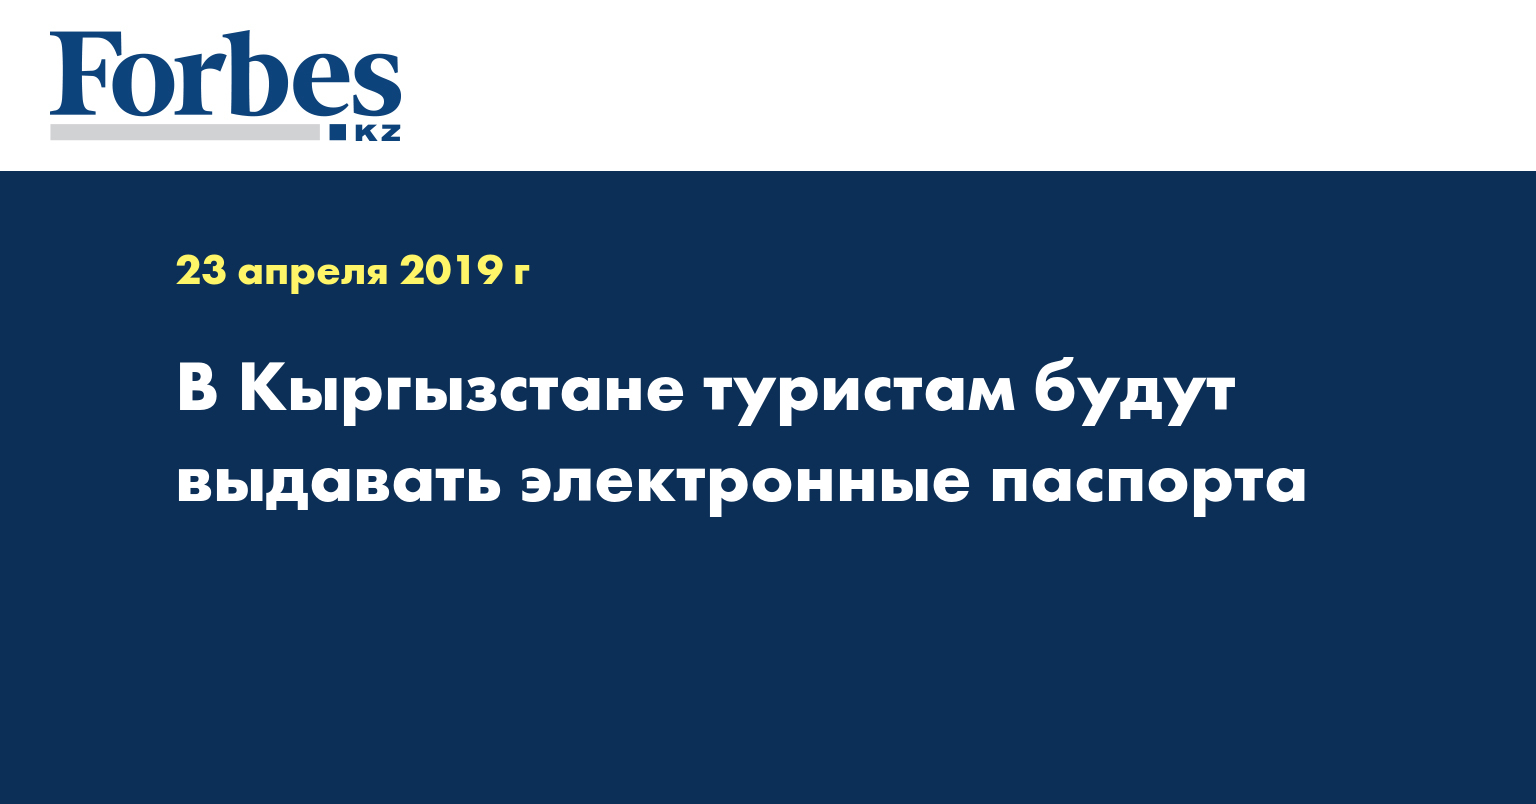 В Кыргызстане туристам будут выдавать электронные паспорта